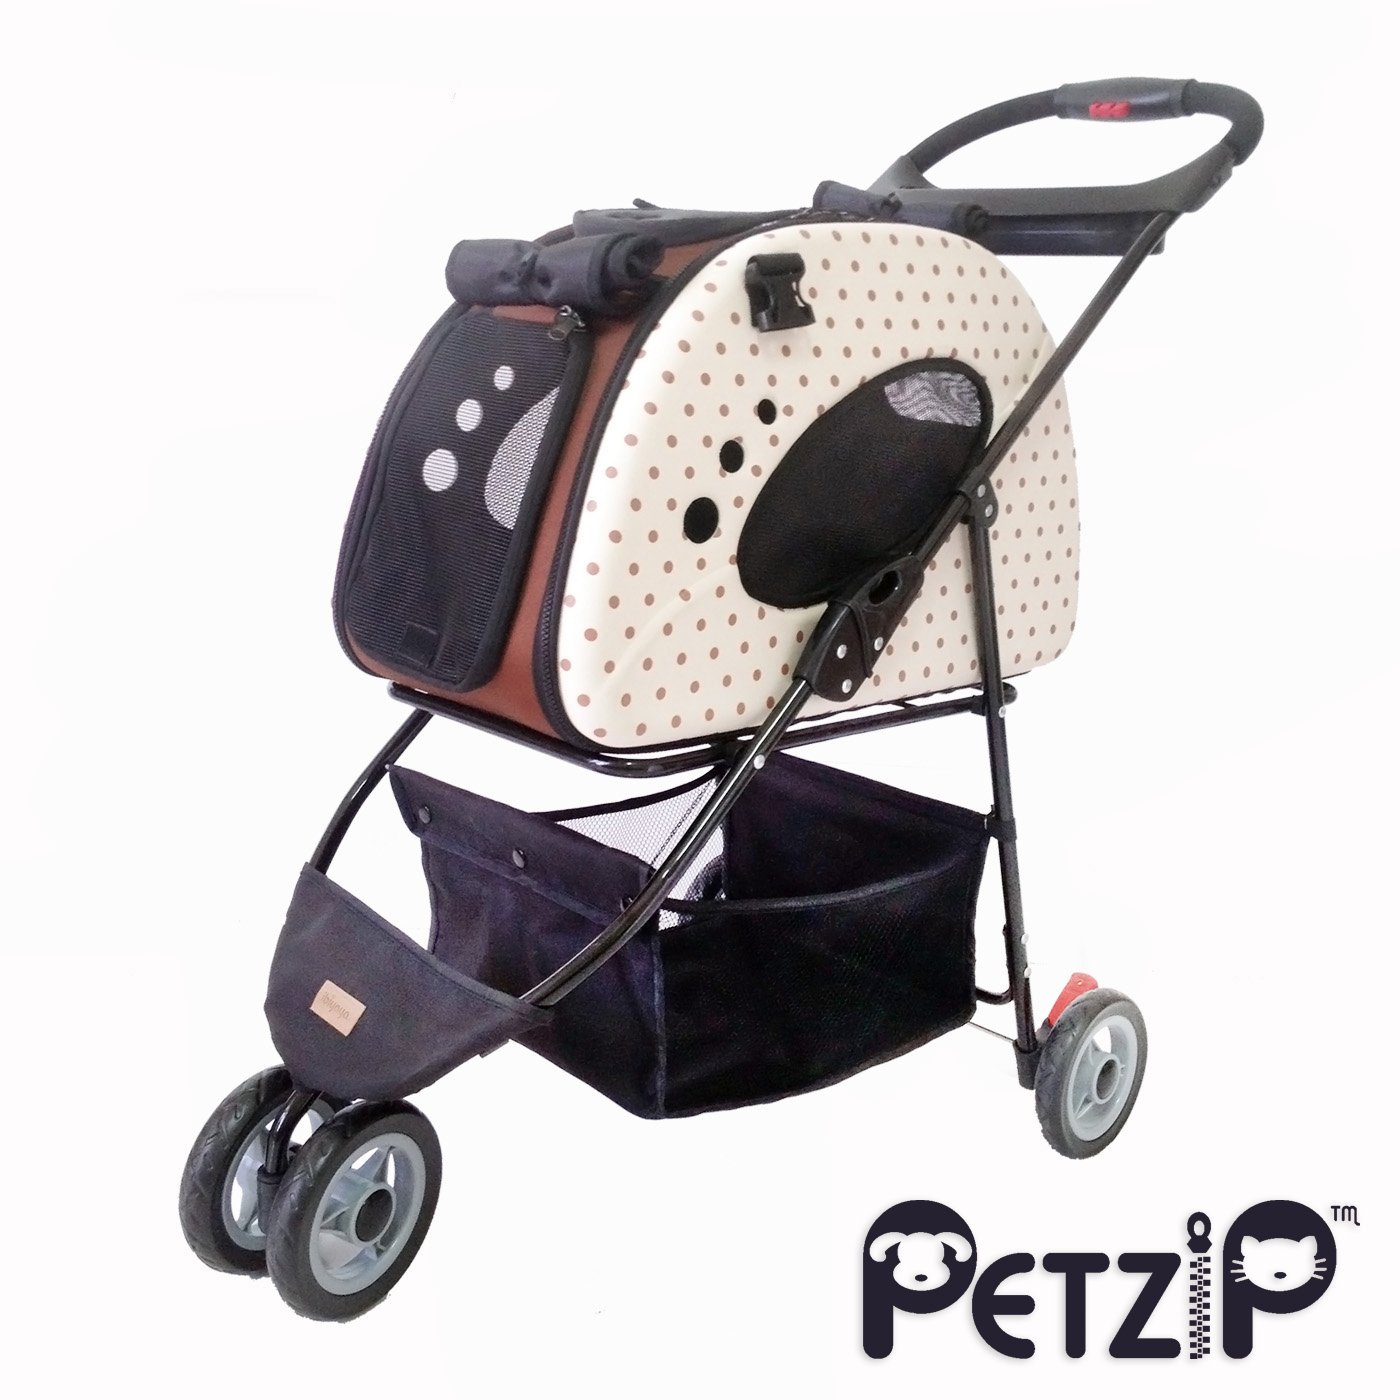 Petzip FS1211-B Mochi Pet Carrier/Stroller, Small, Beige